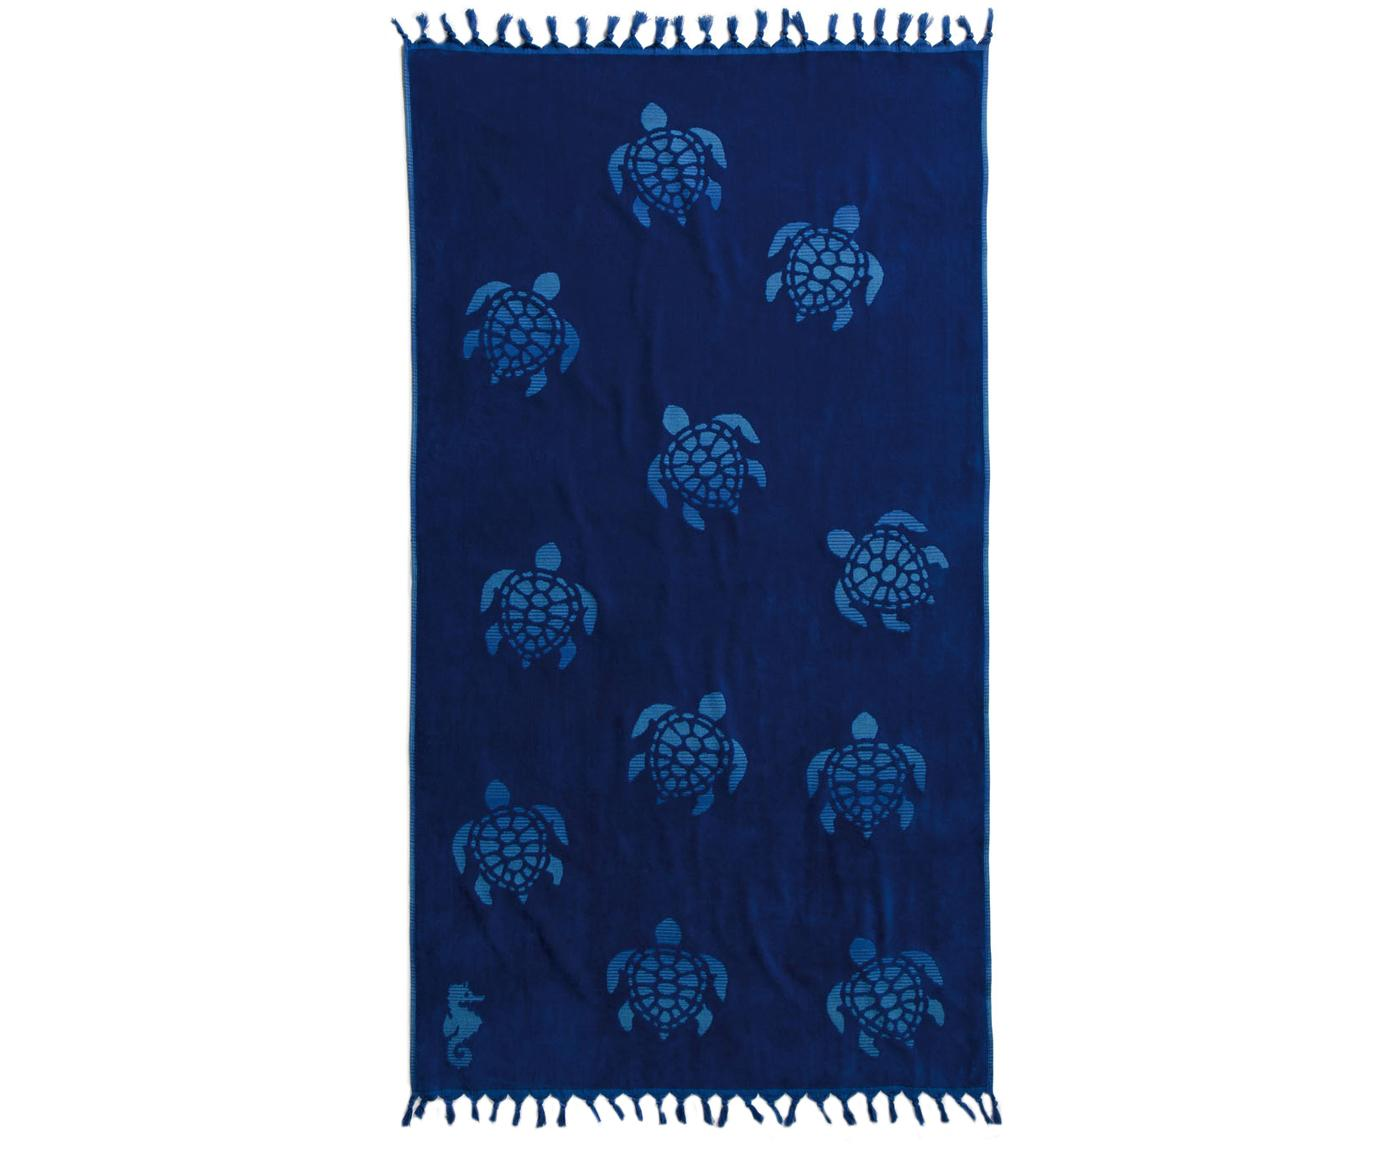 Telo fouta in cotone Tartaruga, Cotone, Blu scuro, Larg. 100 x Lung. 180 cm